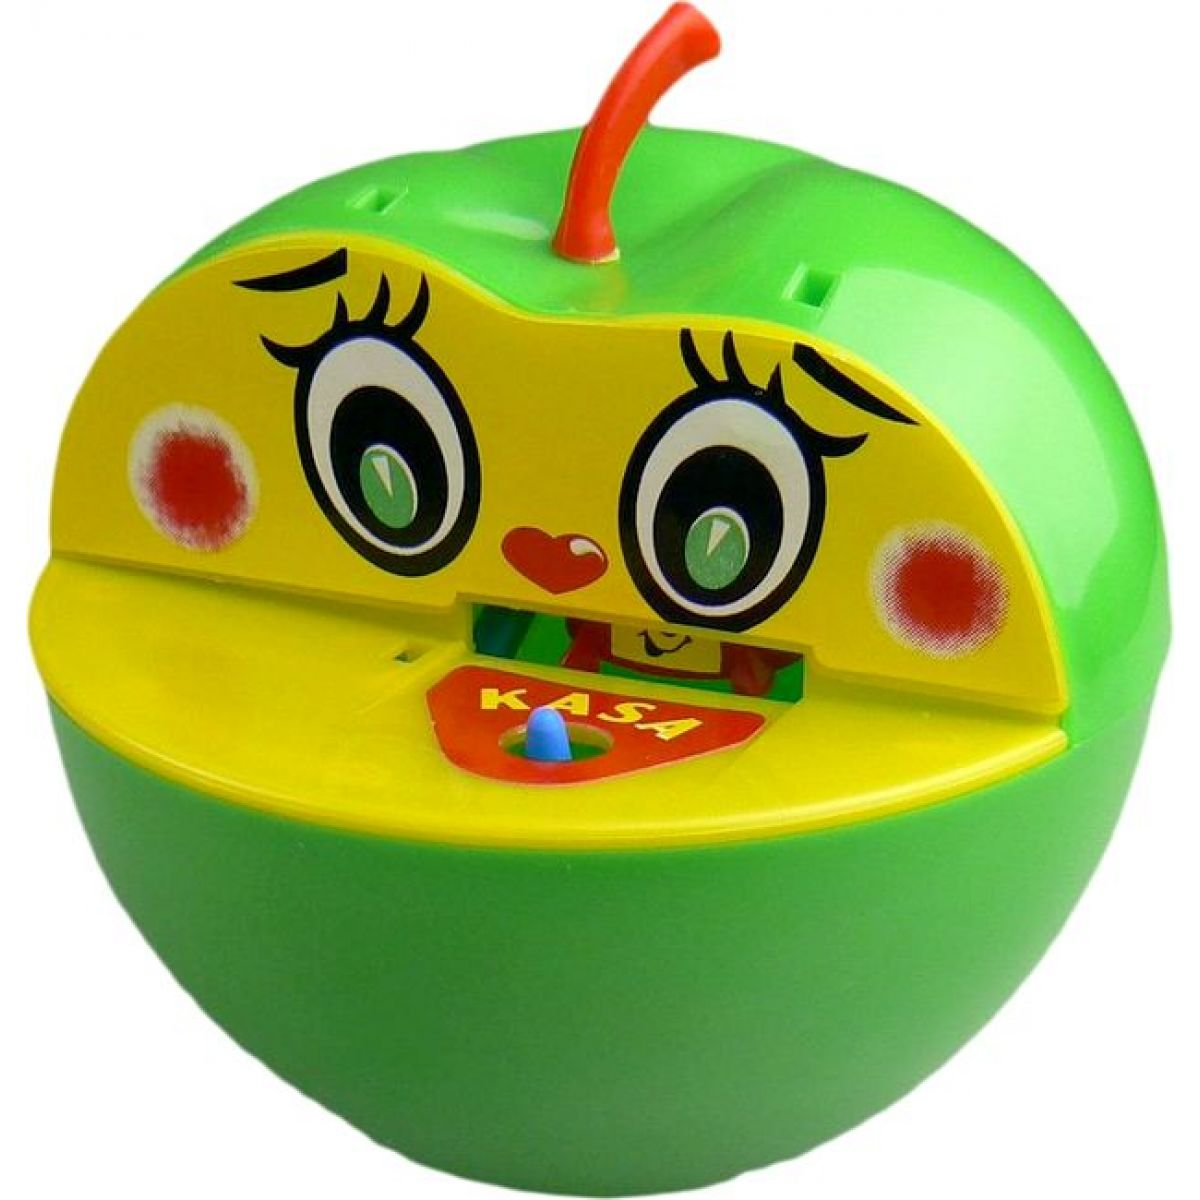 Pokladnička jablko plast 16x10cm - Zelená